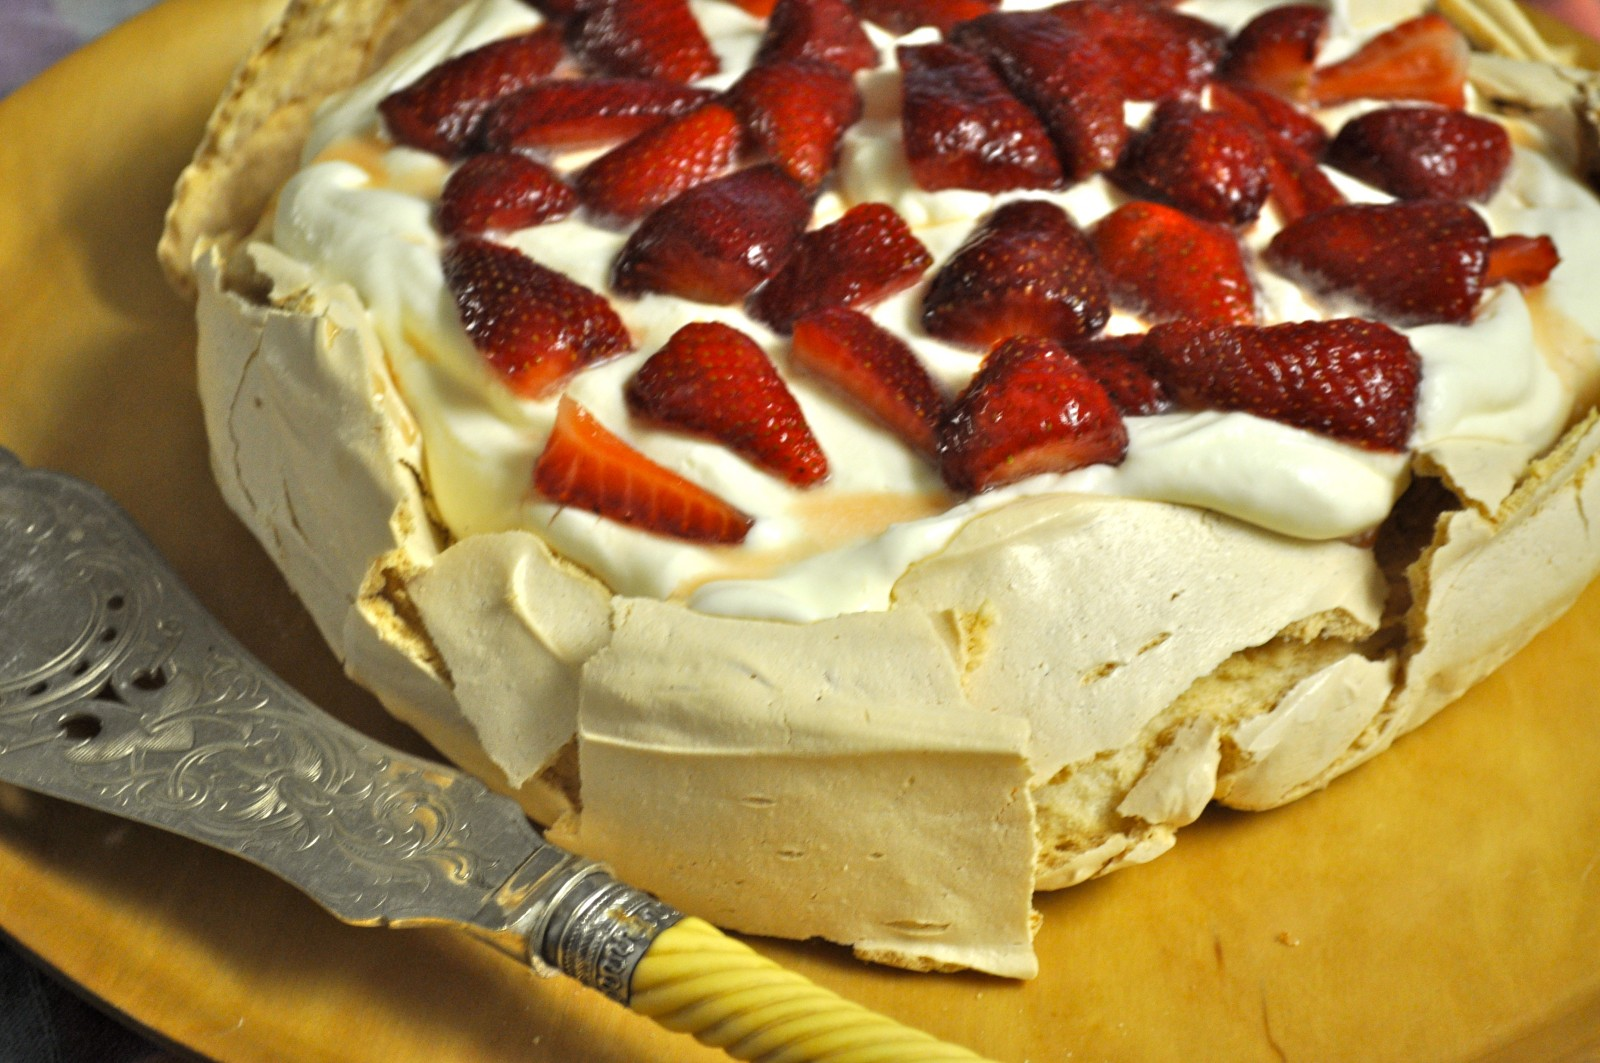 Brown sugar pavlova with vanilla yoghurt cream – Australian pavlova blog hop